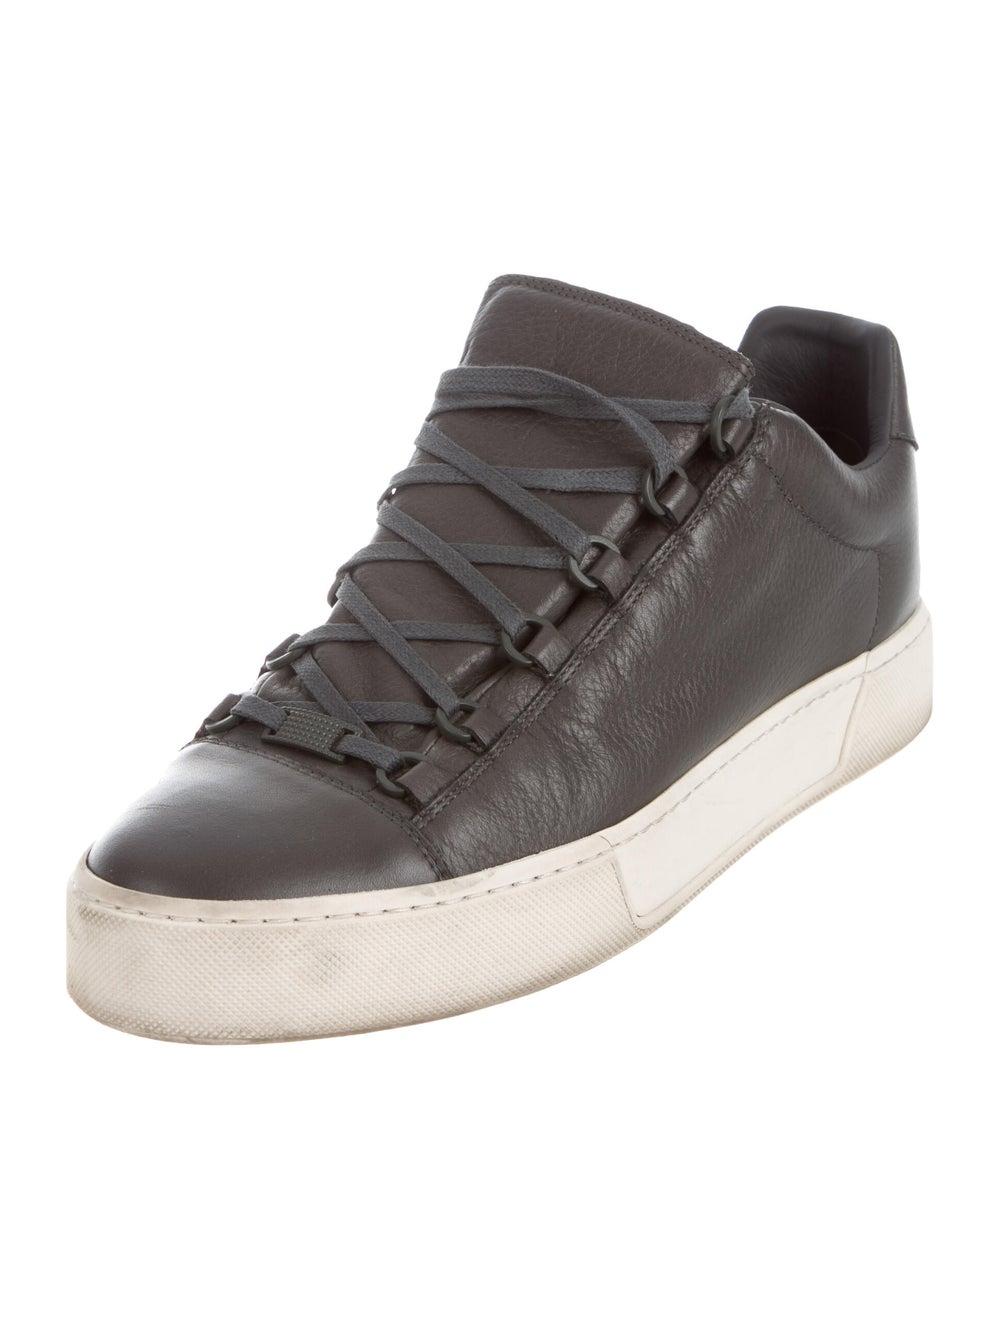 Balenciaga Cap-Toe Low-Top Sneakers Gris - image 2